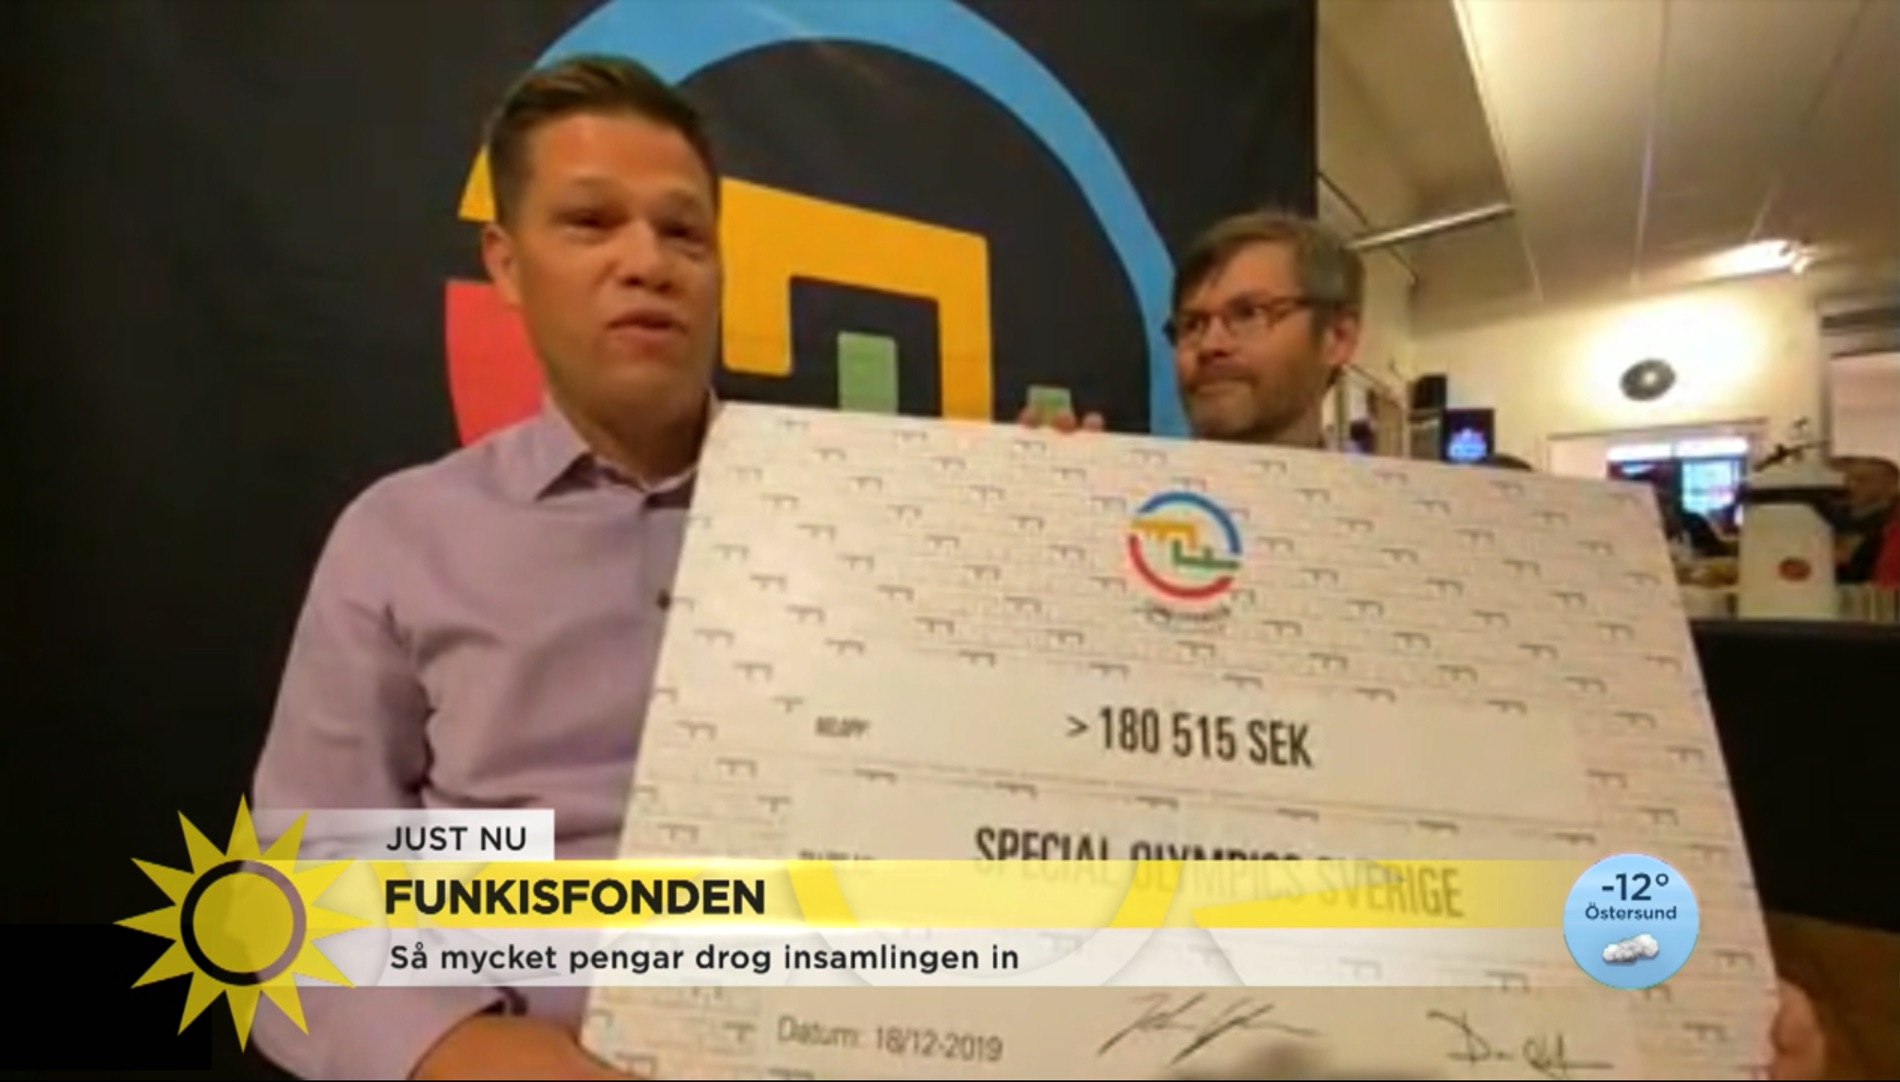 Funkisfonden och Special Olympics i Nyhetsmorgon.